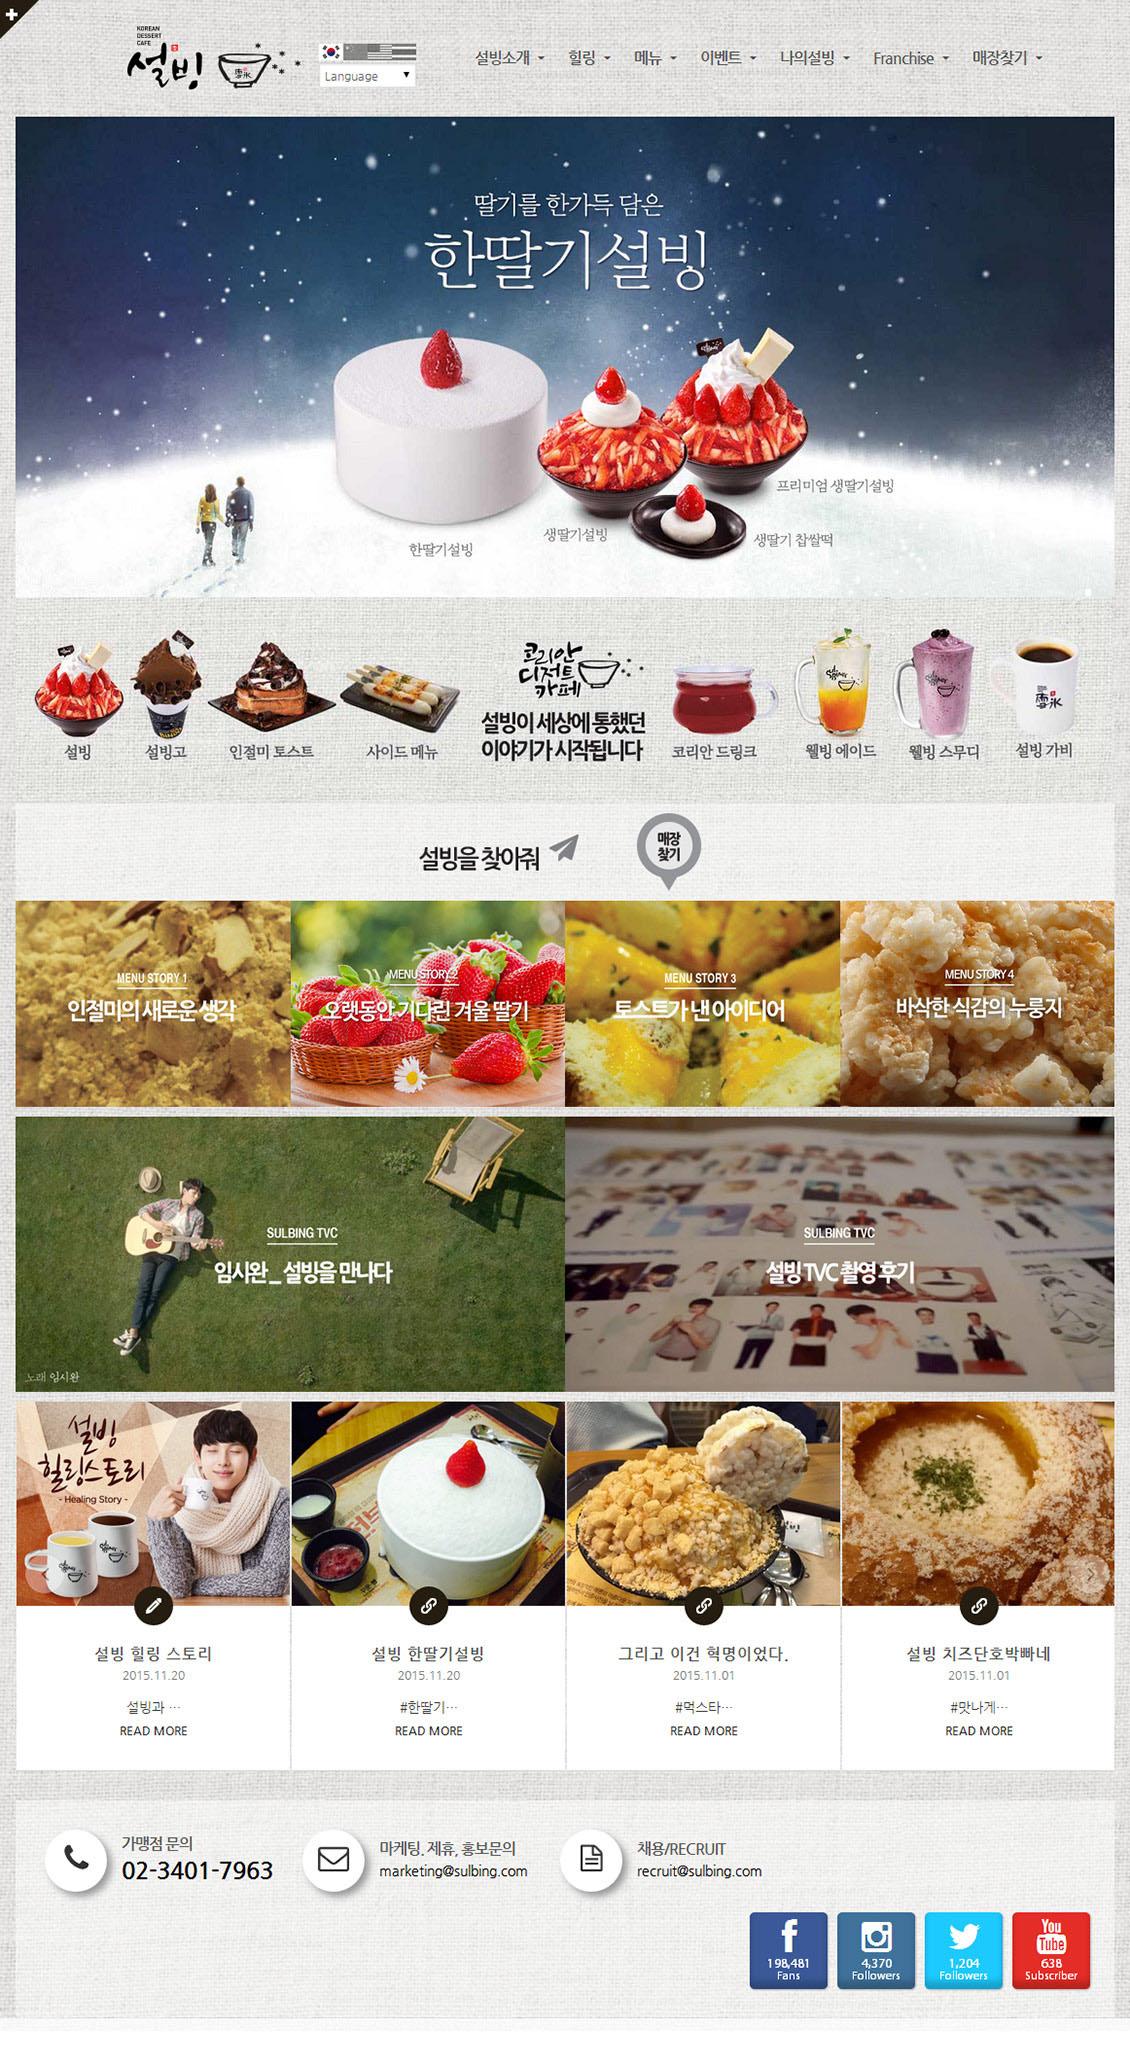 韩国SULBING甜品美食网站